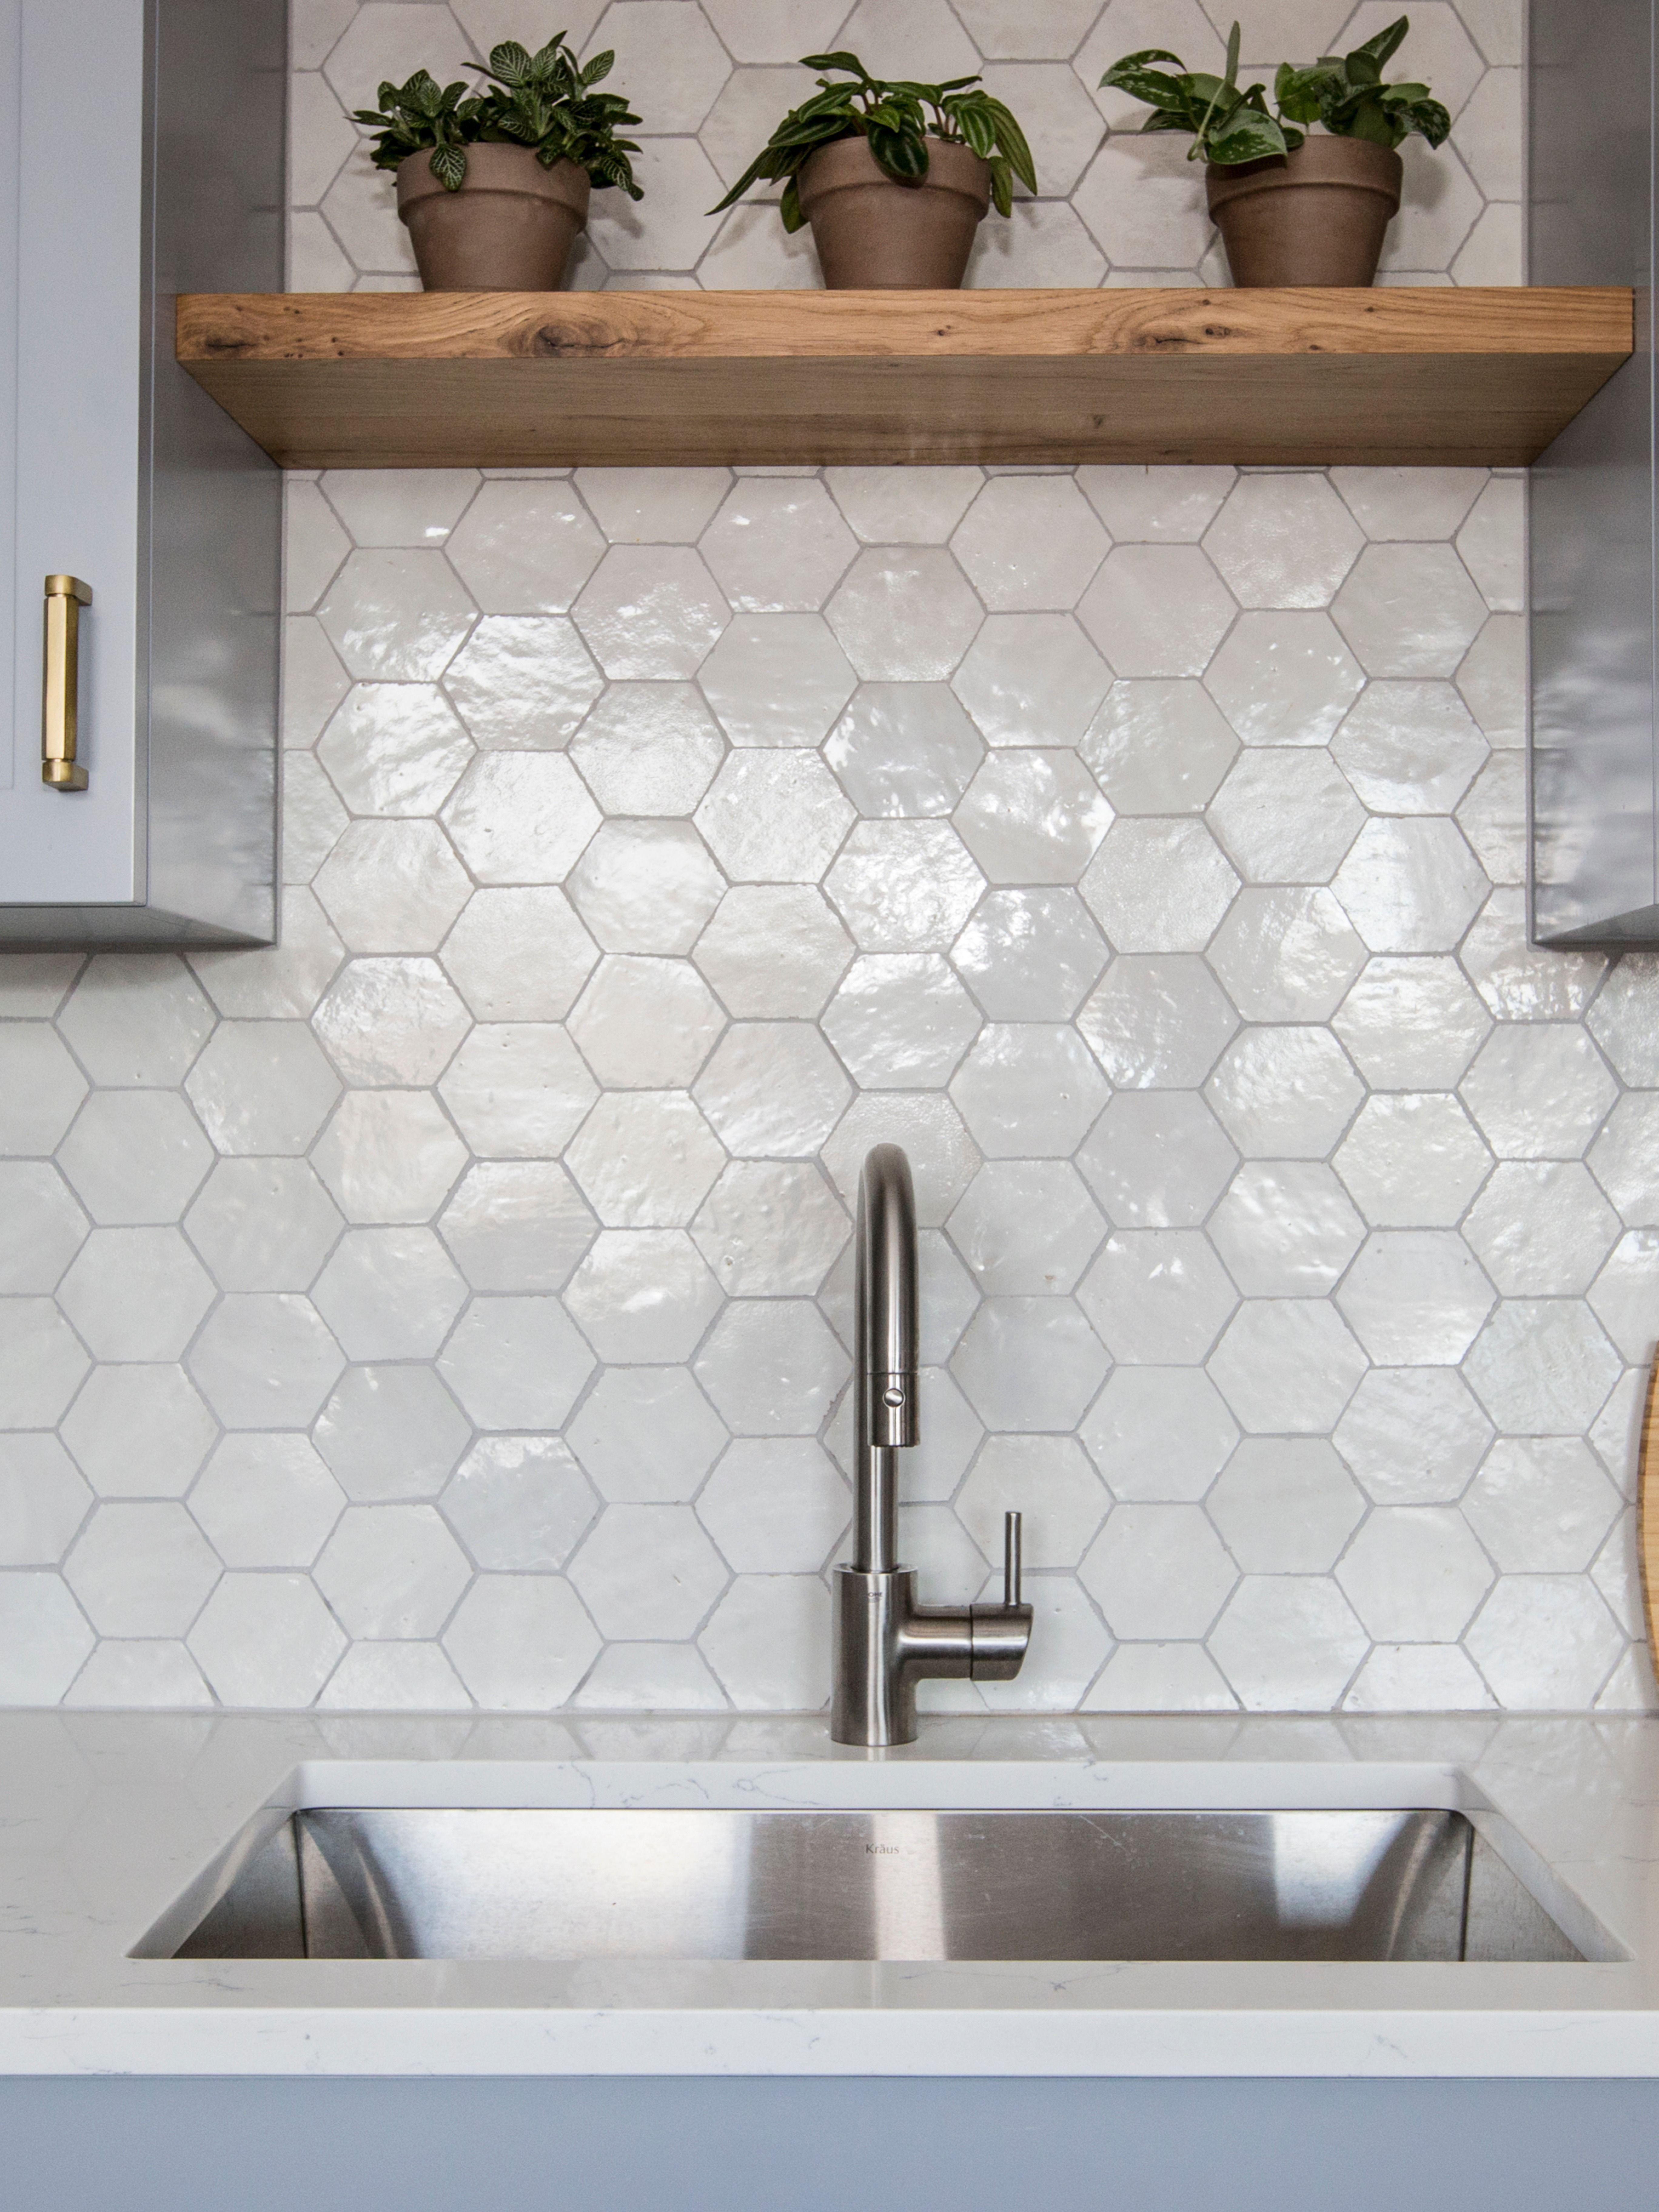 Backsplash Cle Glossy Hexagon Kitchen Tiles Backsplash Tile Zellige Kitchen Wall Tiles Hexagon Tile Backsplash Modern Kitchen Design